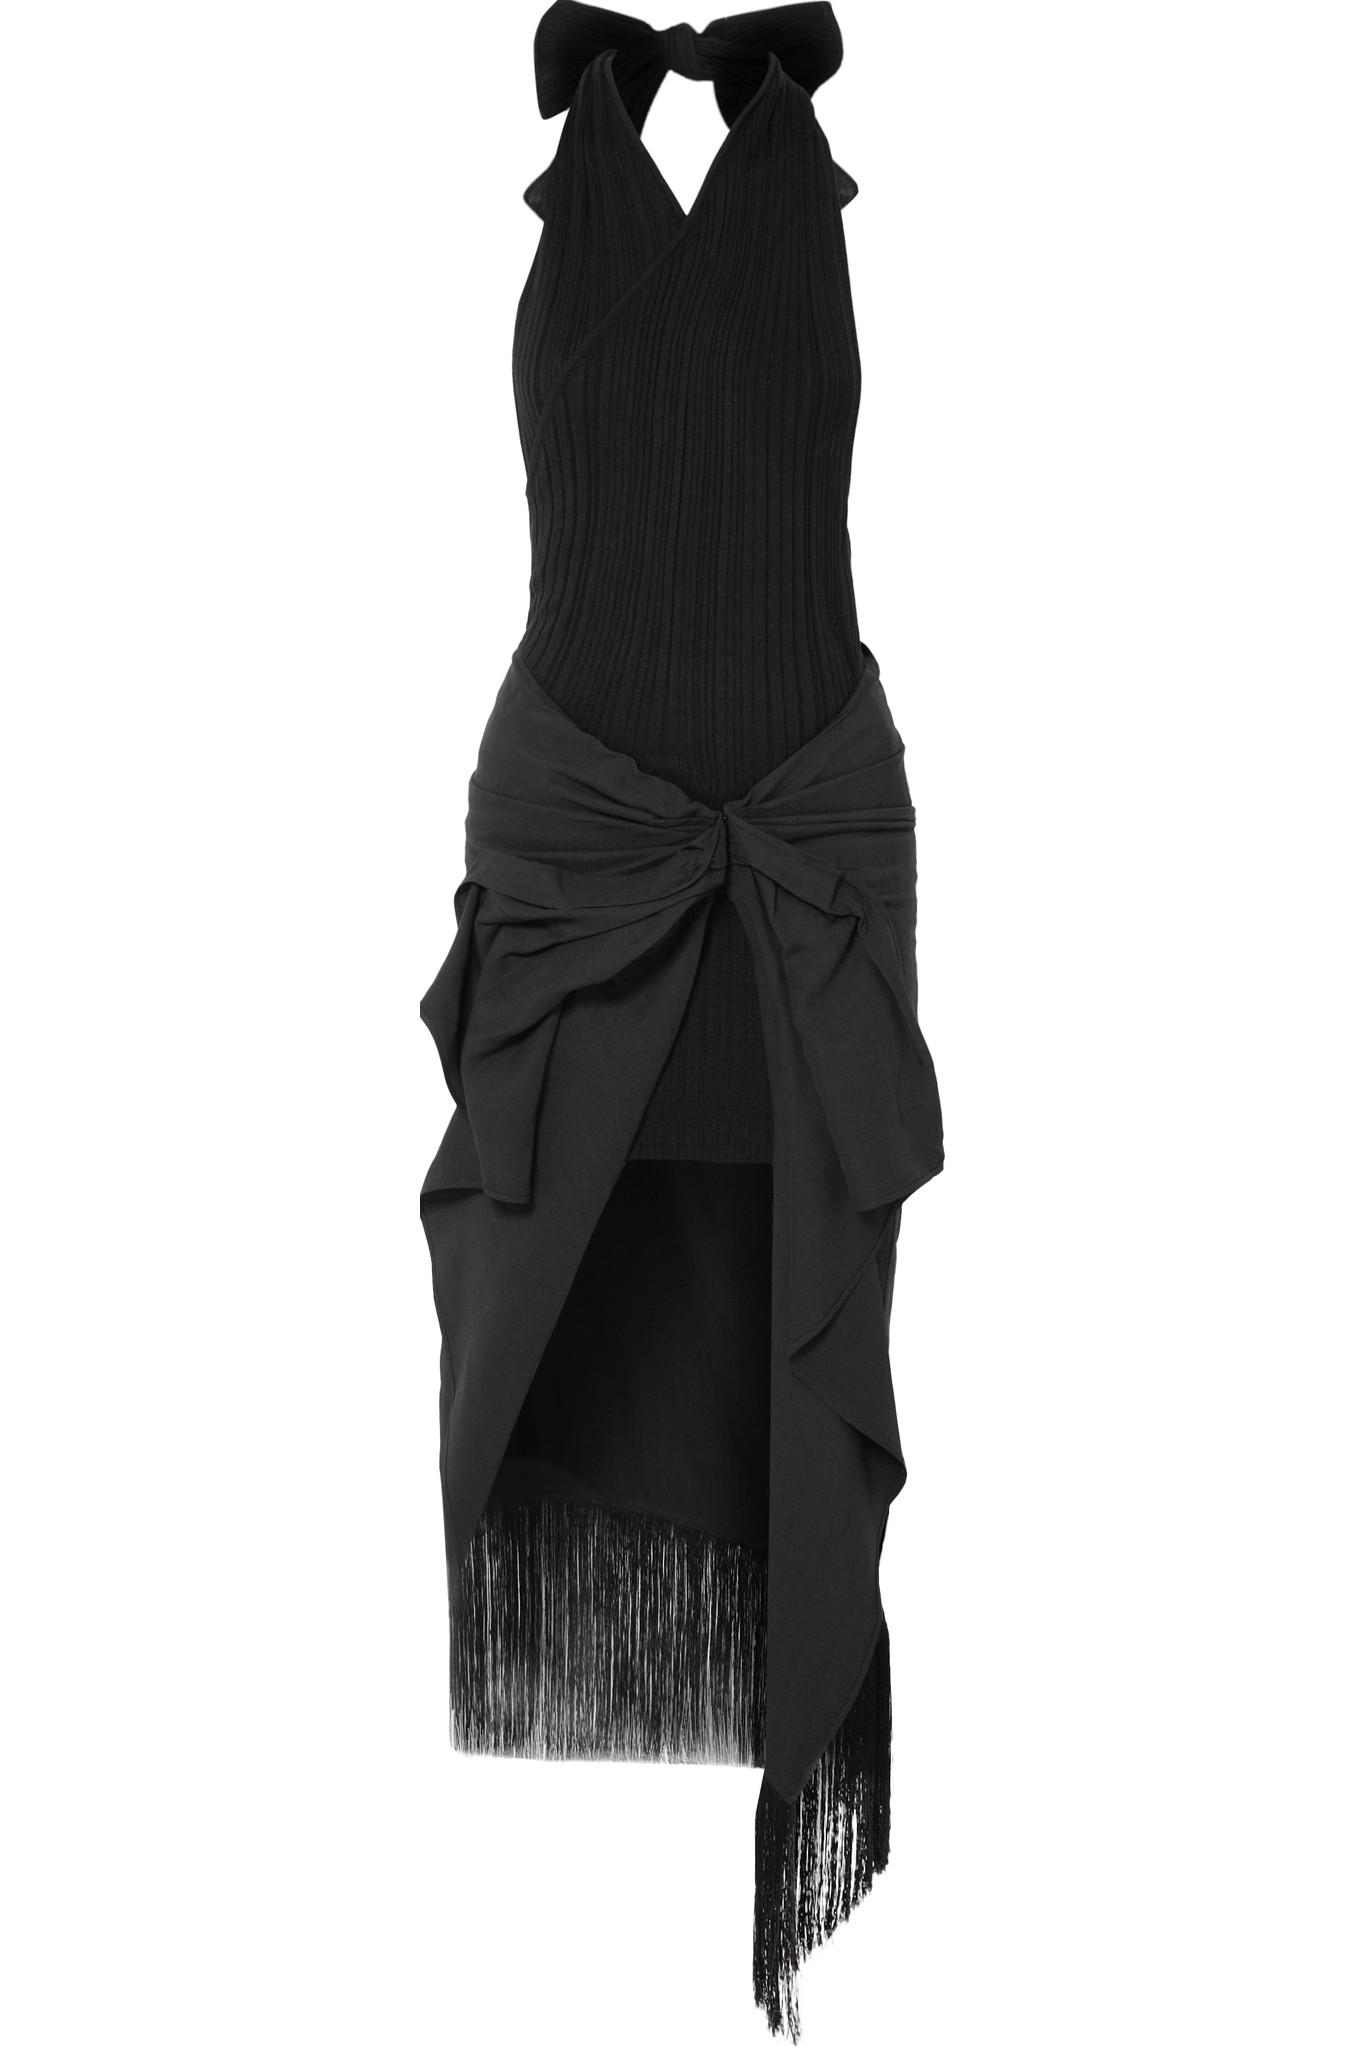 La Robe Drapeado Stretch-jersey And Voile Halterneck Dress - Black Jacquemus 9l6PDw0